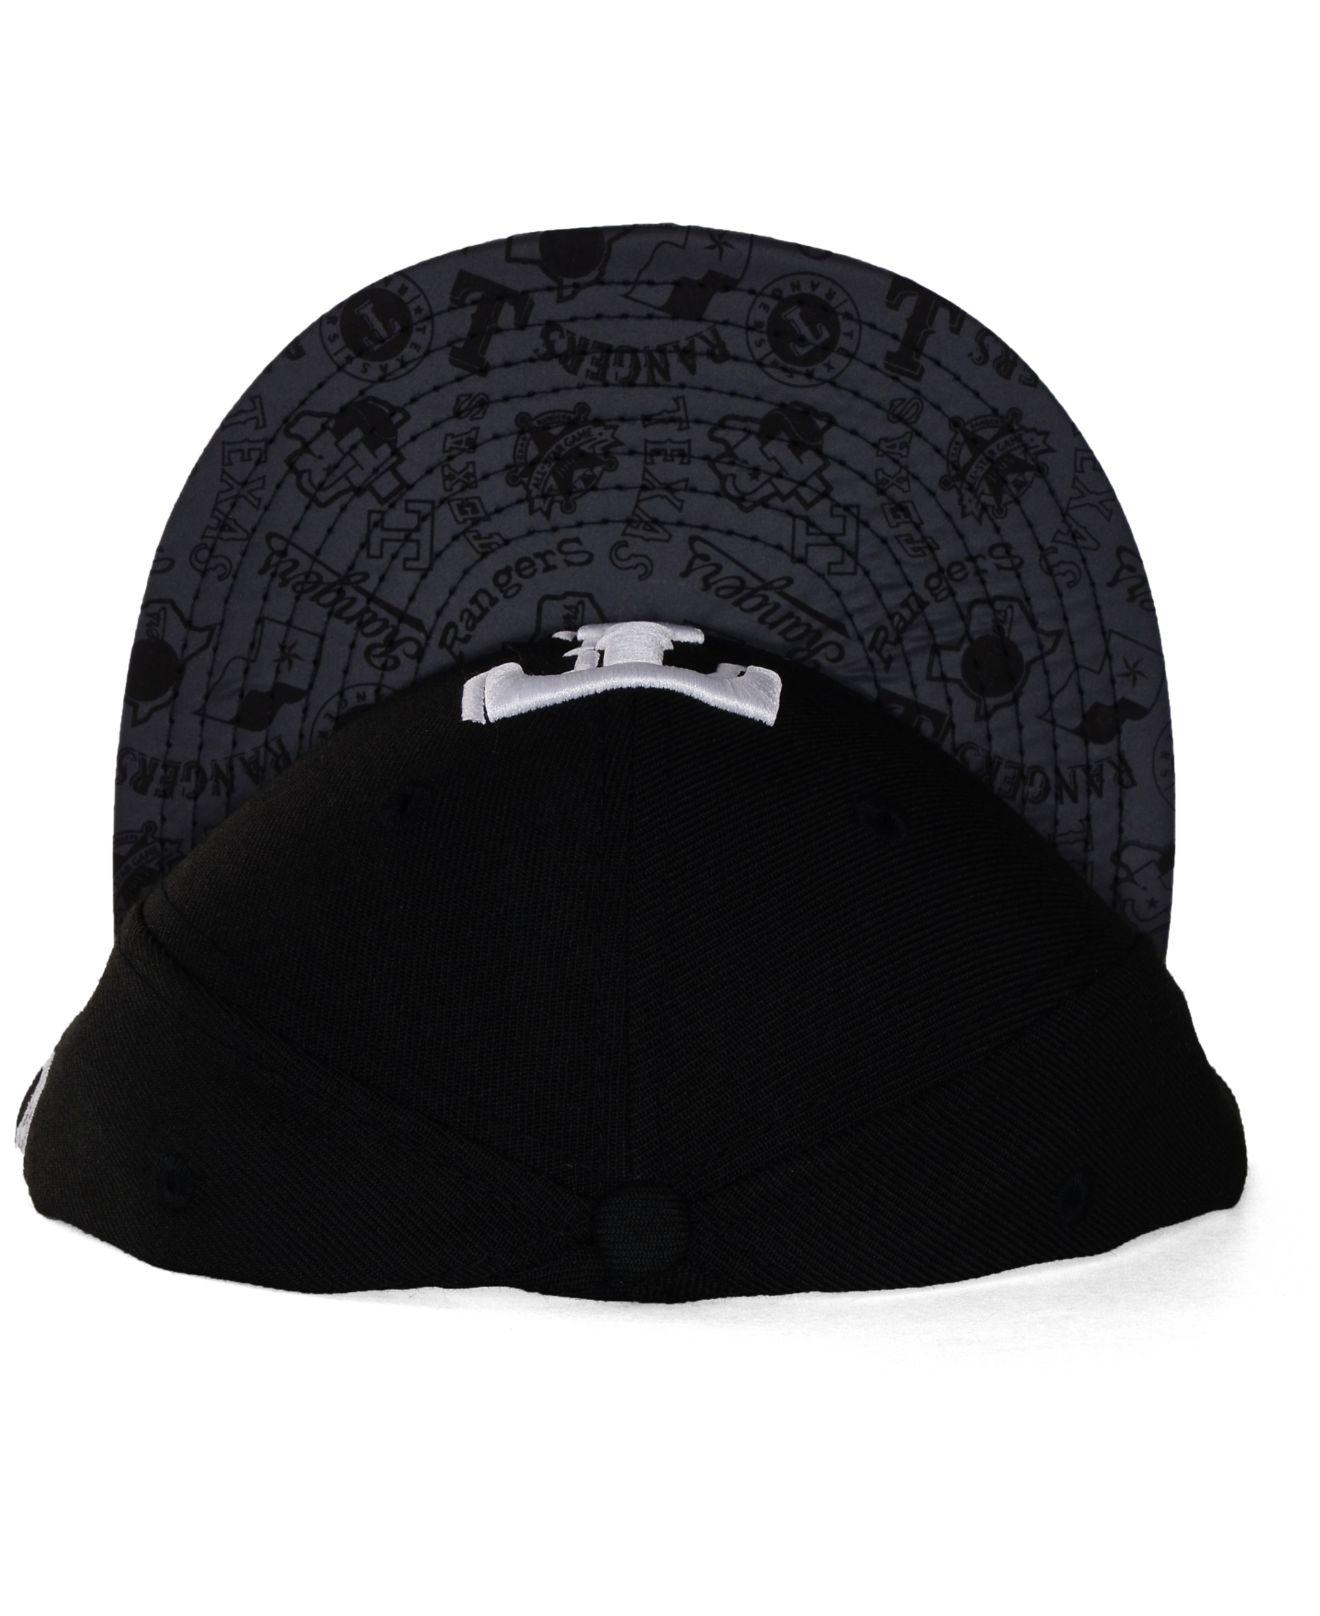 96dbfe6f55c ... netherlands lyst ktz texas rangers reflective viz 59fifty cap in black  for men 409c2 ff2ce